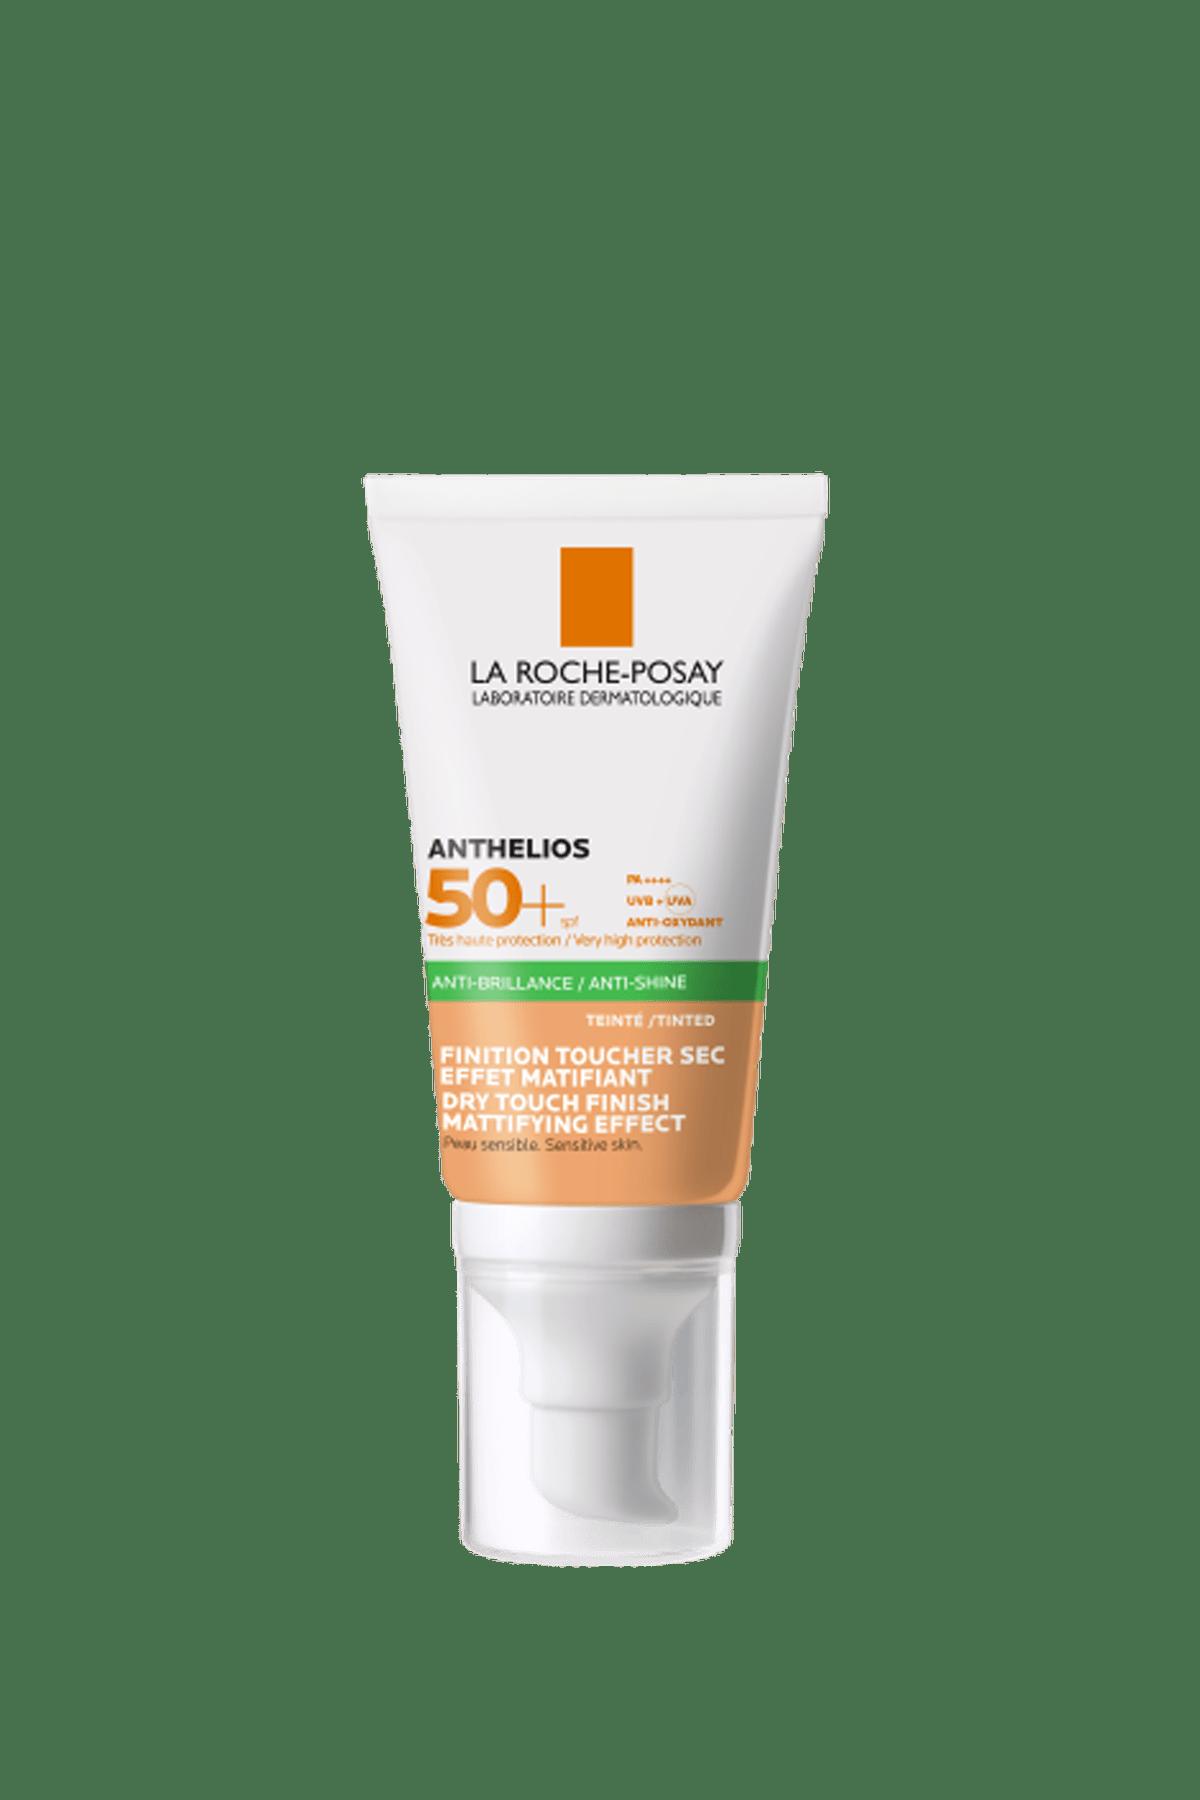 La Roche Posay Anthelios Xl Spf 50+ Tinted Dry Touch Gel-Cream Yüksek Güneş Koruması 50 ml